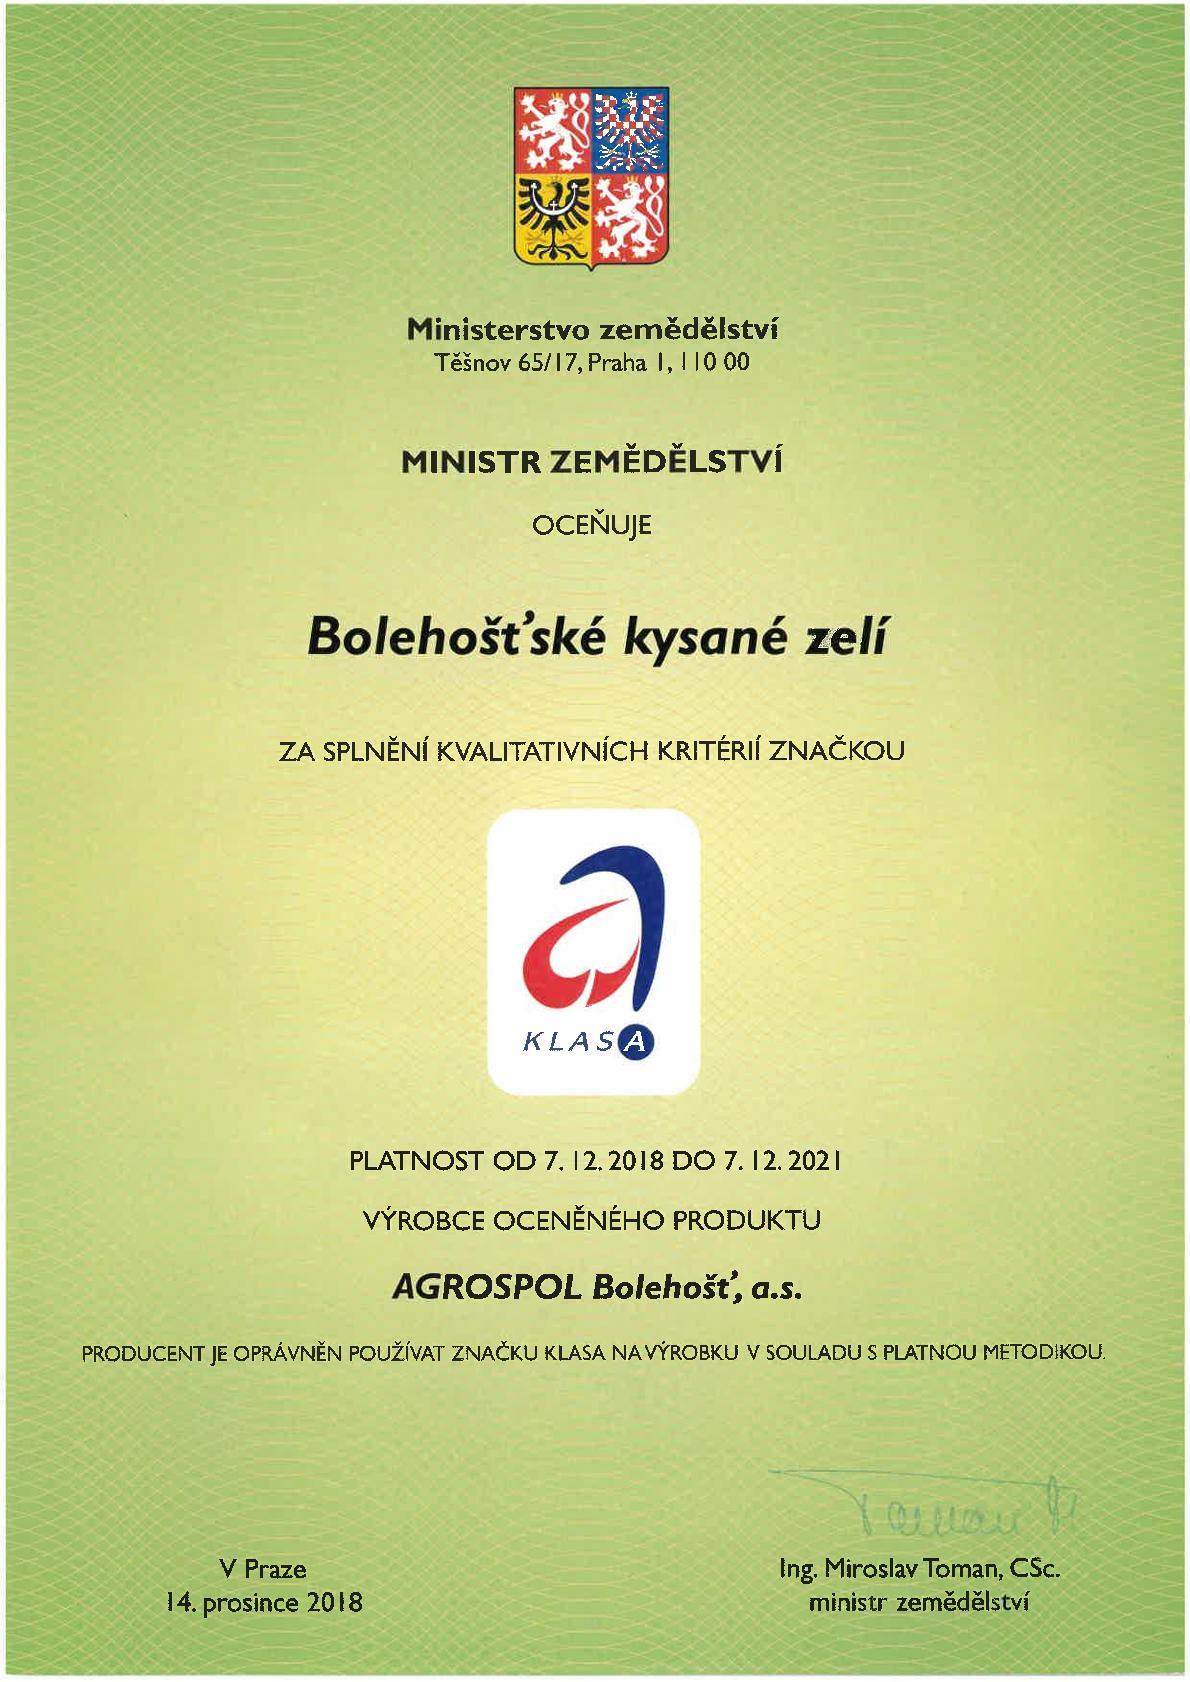 AGROSPOL Bolehošť, a. s. - Certifikát 01